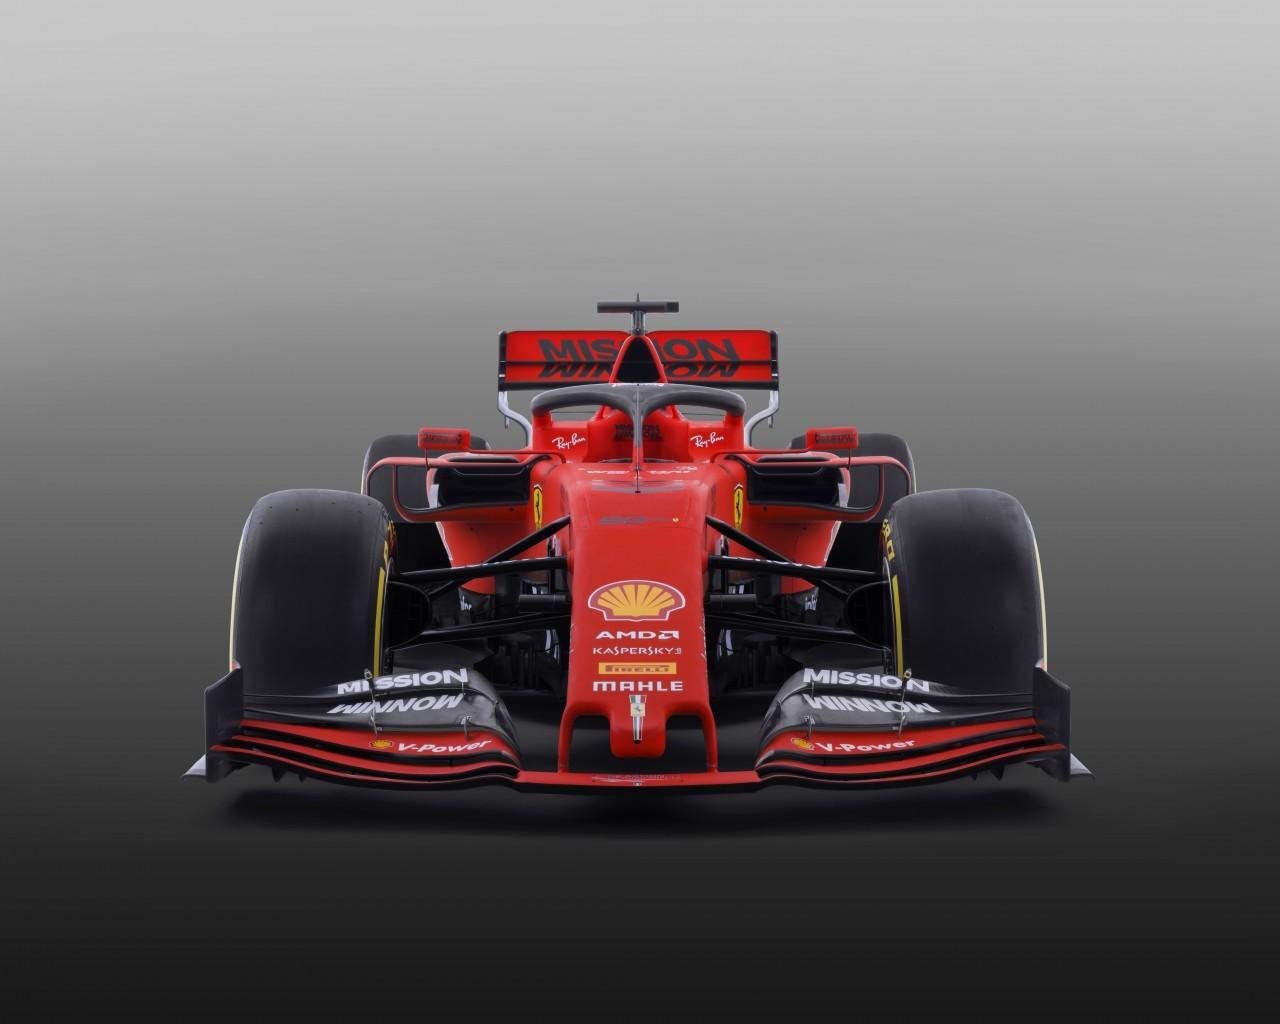 Free download Download 1280x1024 Ferrari Sf90 Formula 1 ...